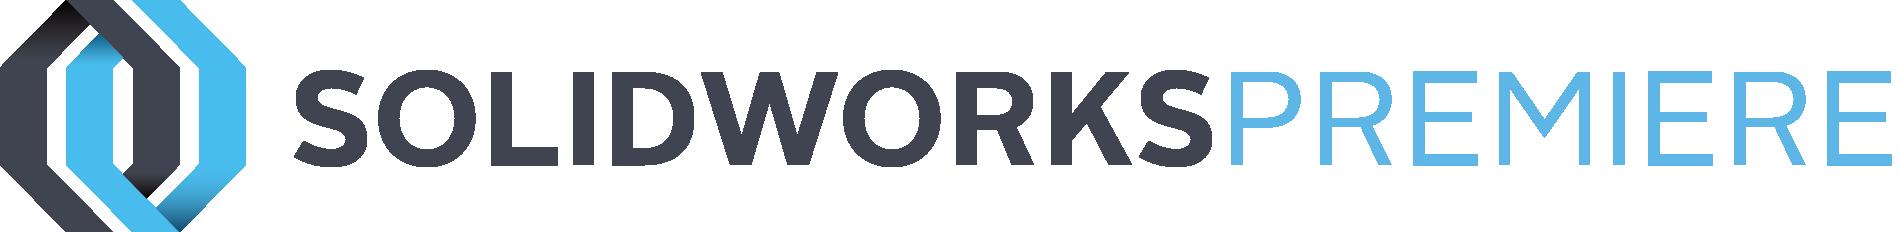 SOLIDWORKS 2017 PREMIERE